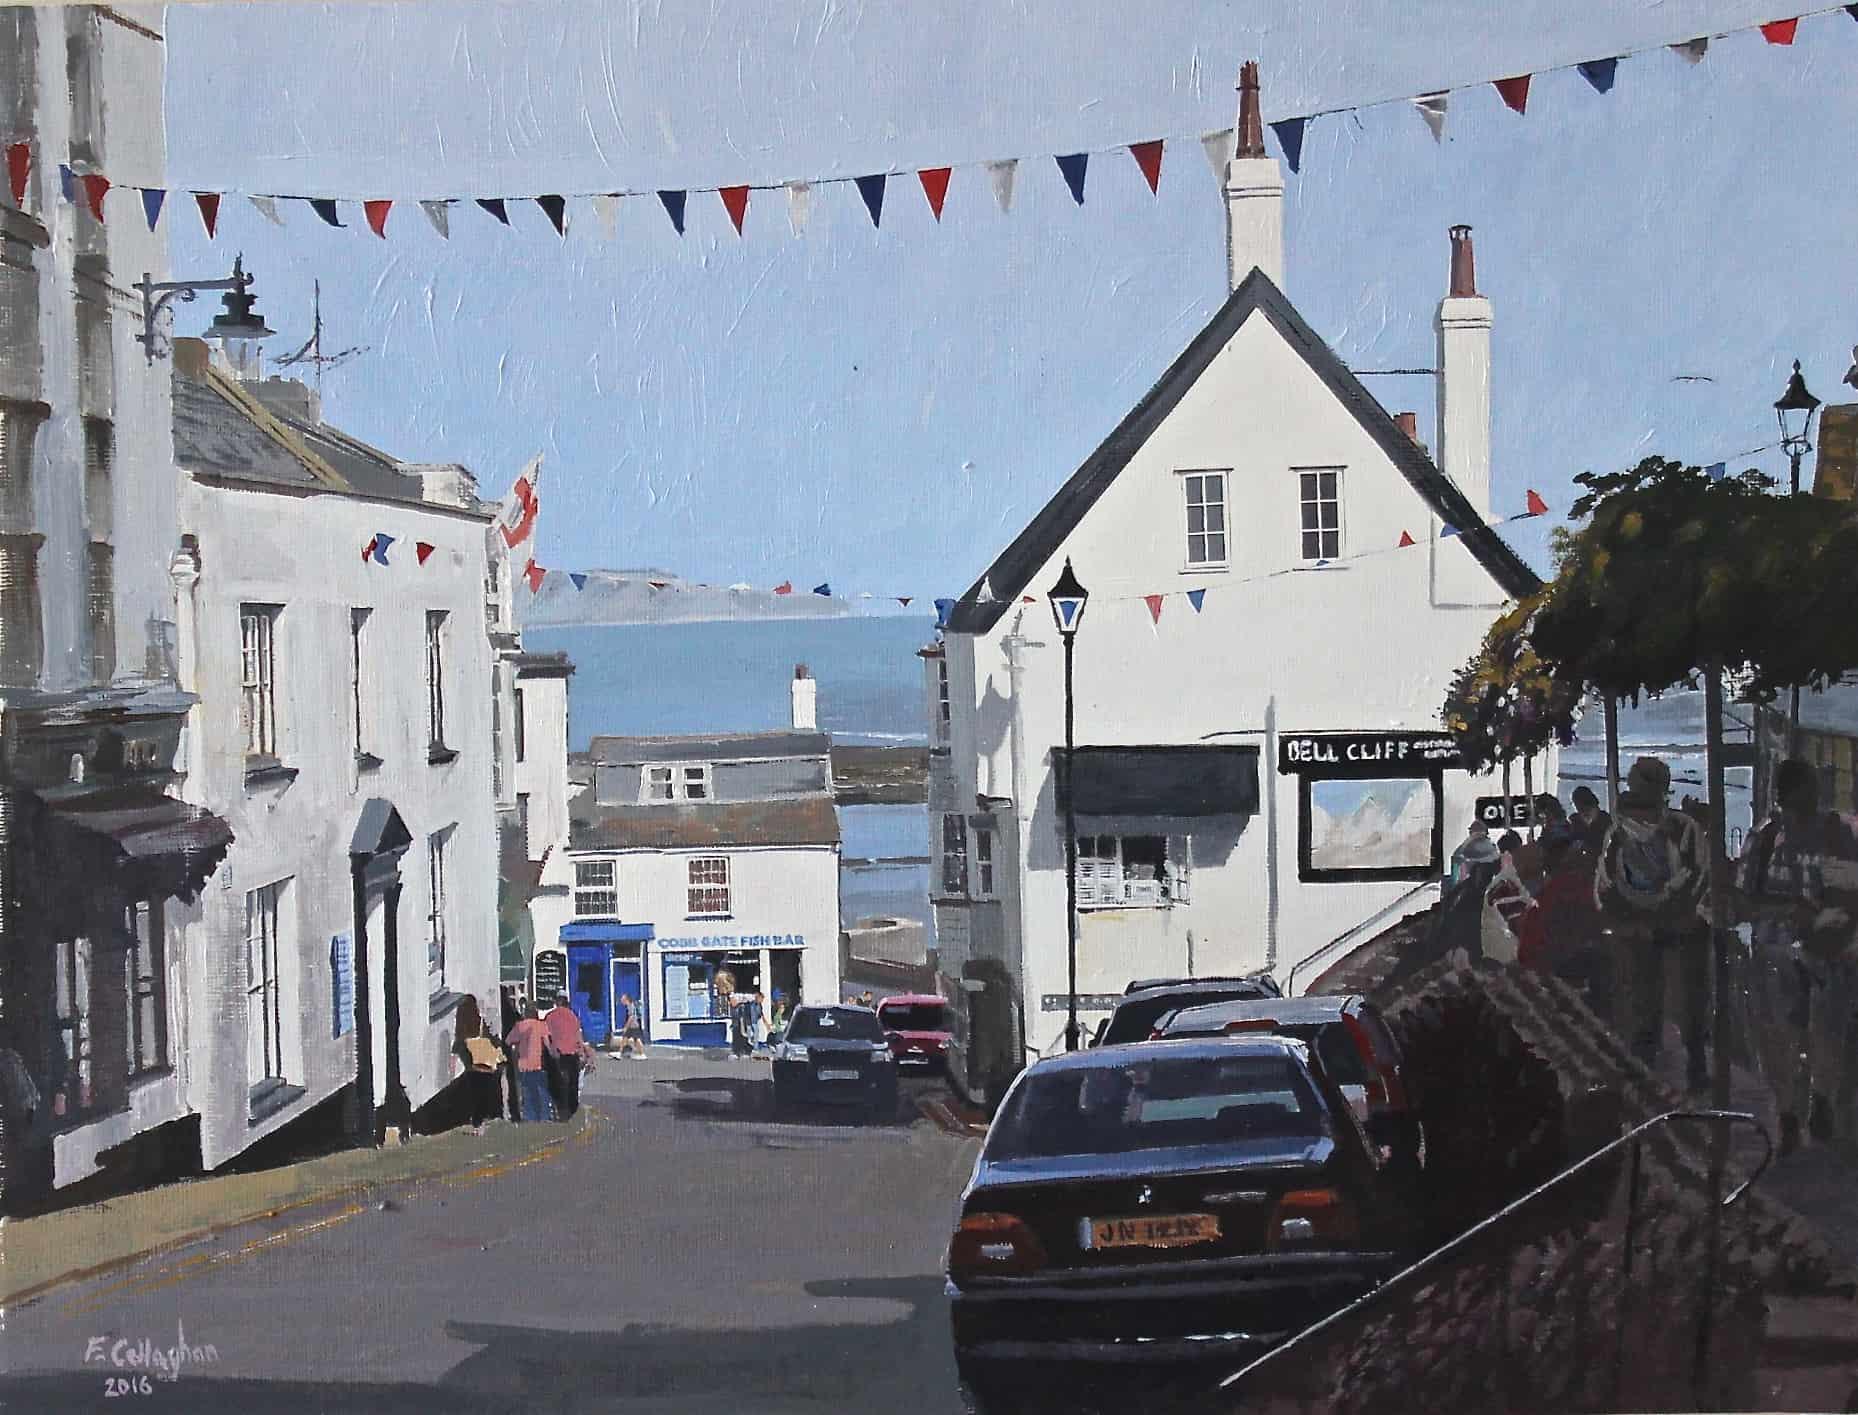 Lyme Regis High Street Painted by Frank Callaghan